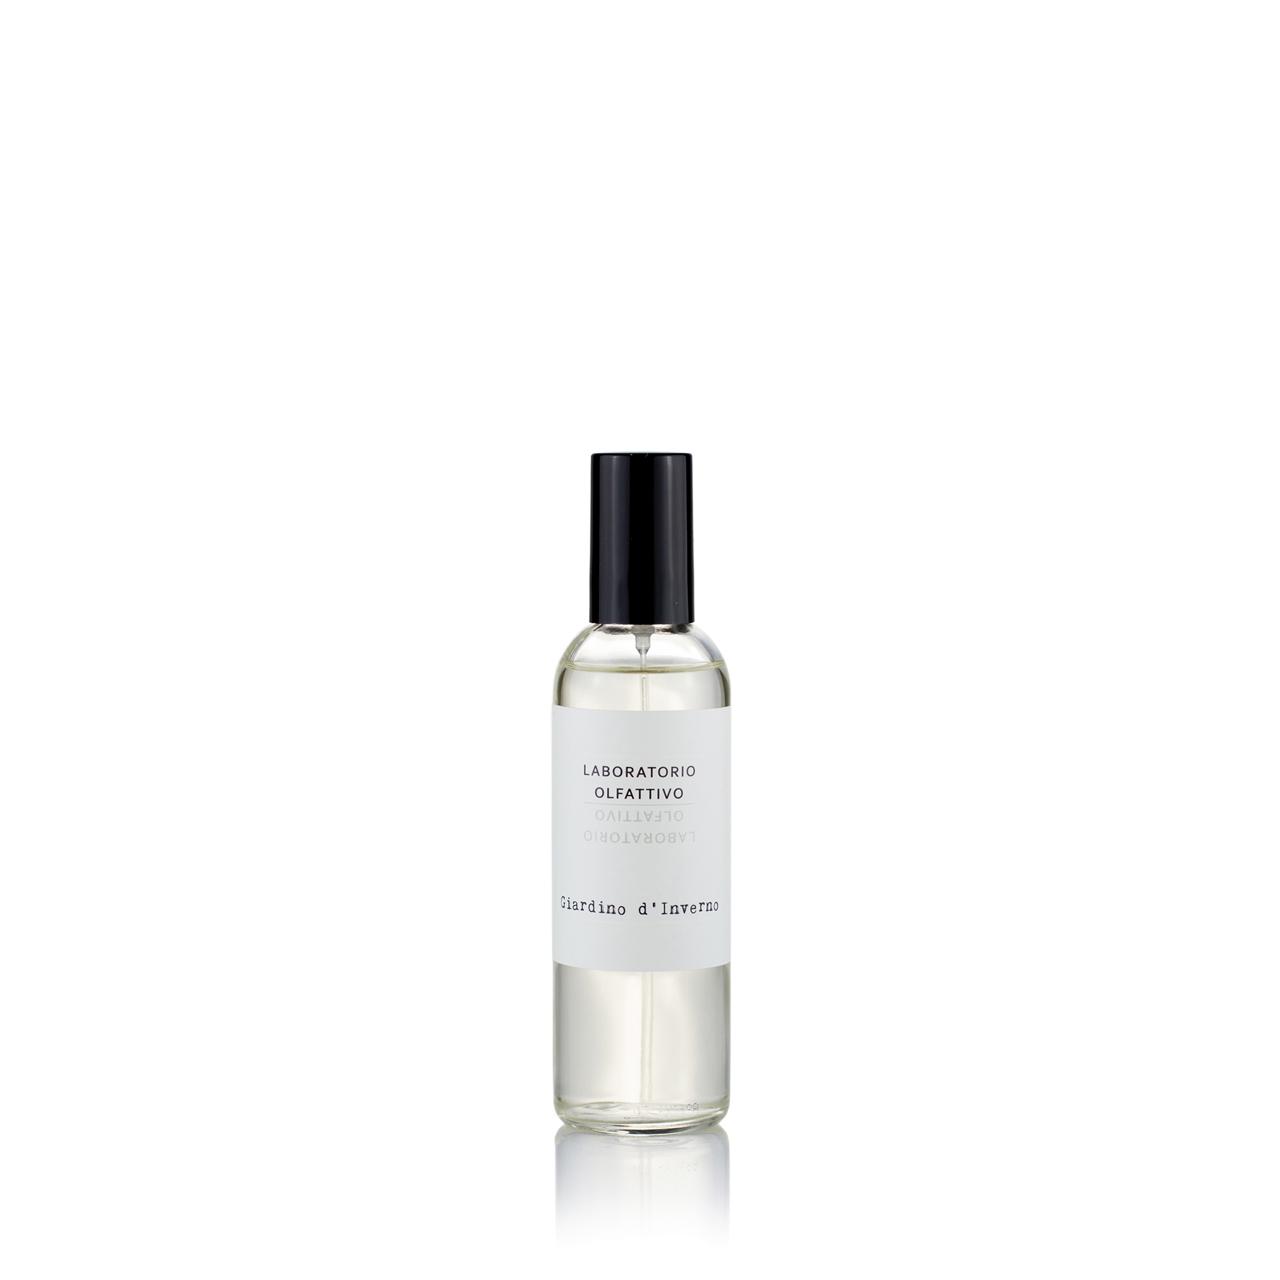 GIARDINO D'INVERNO - Room Fragrance